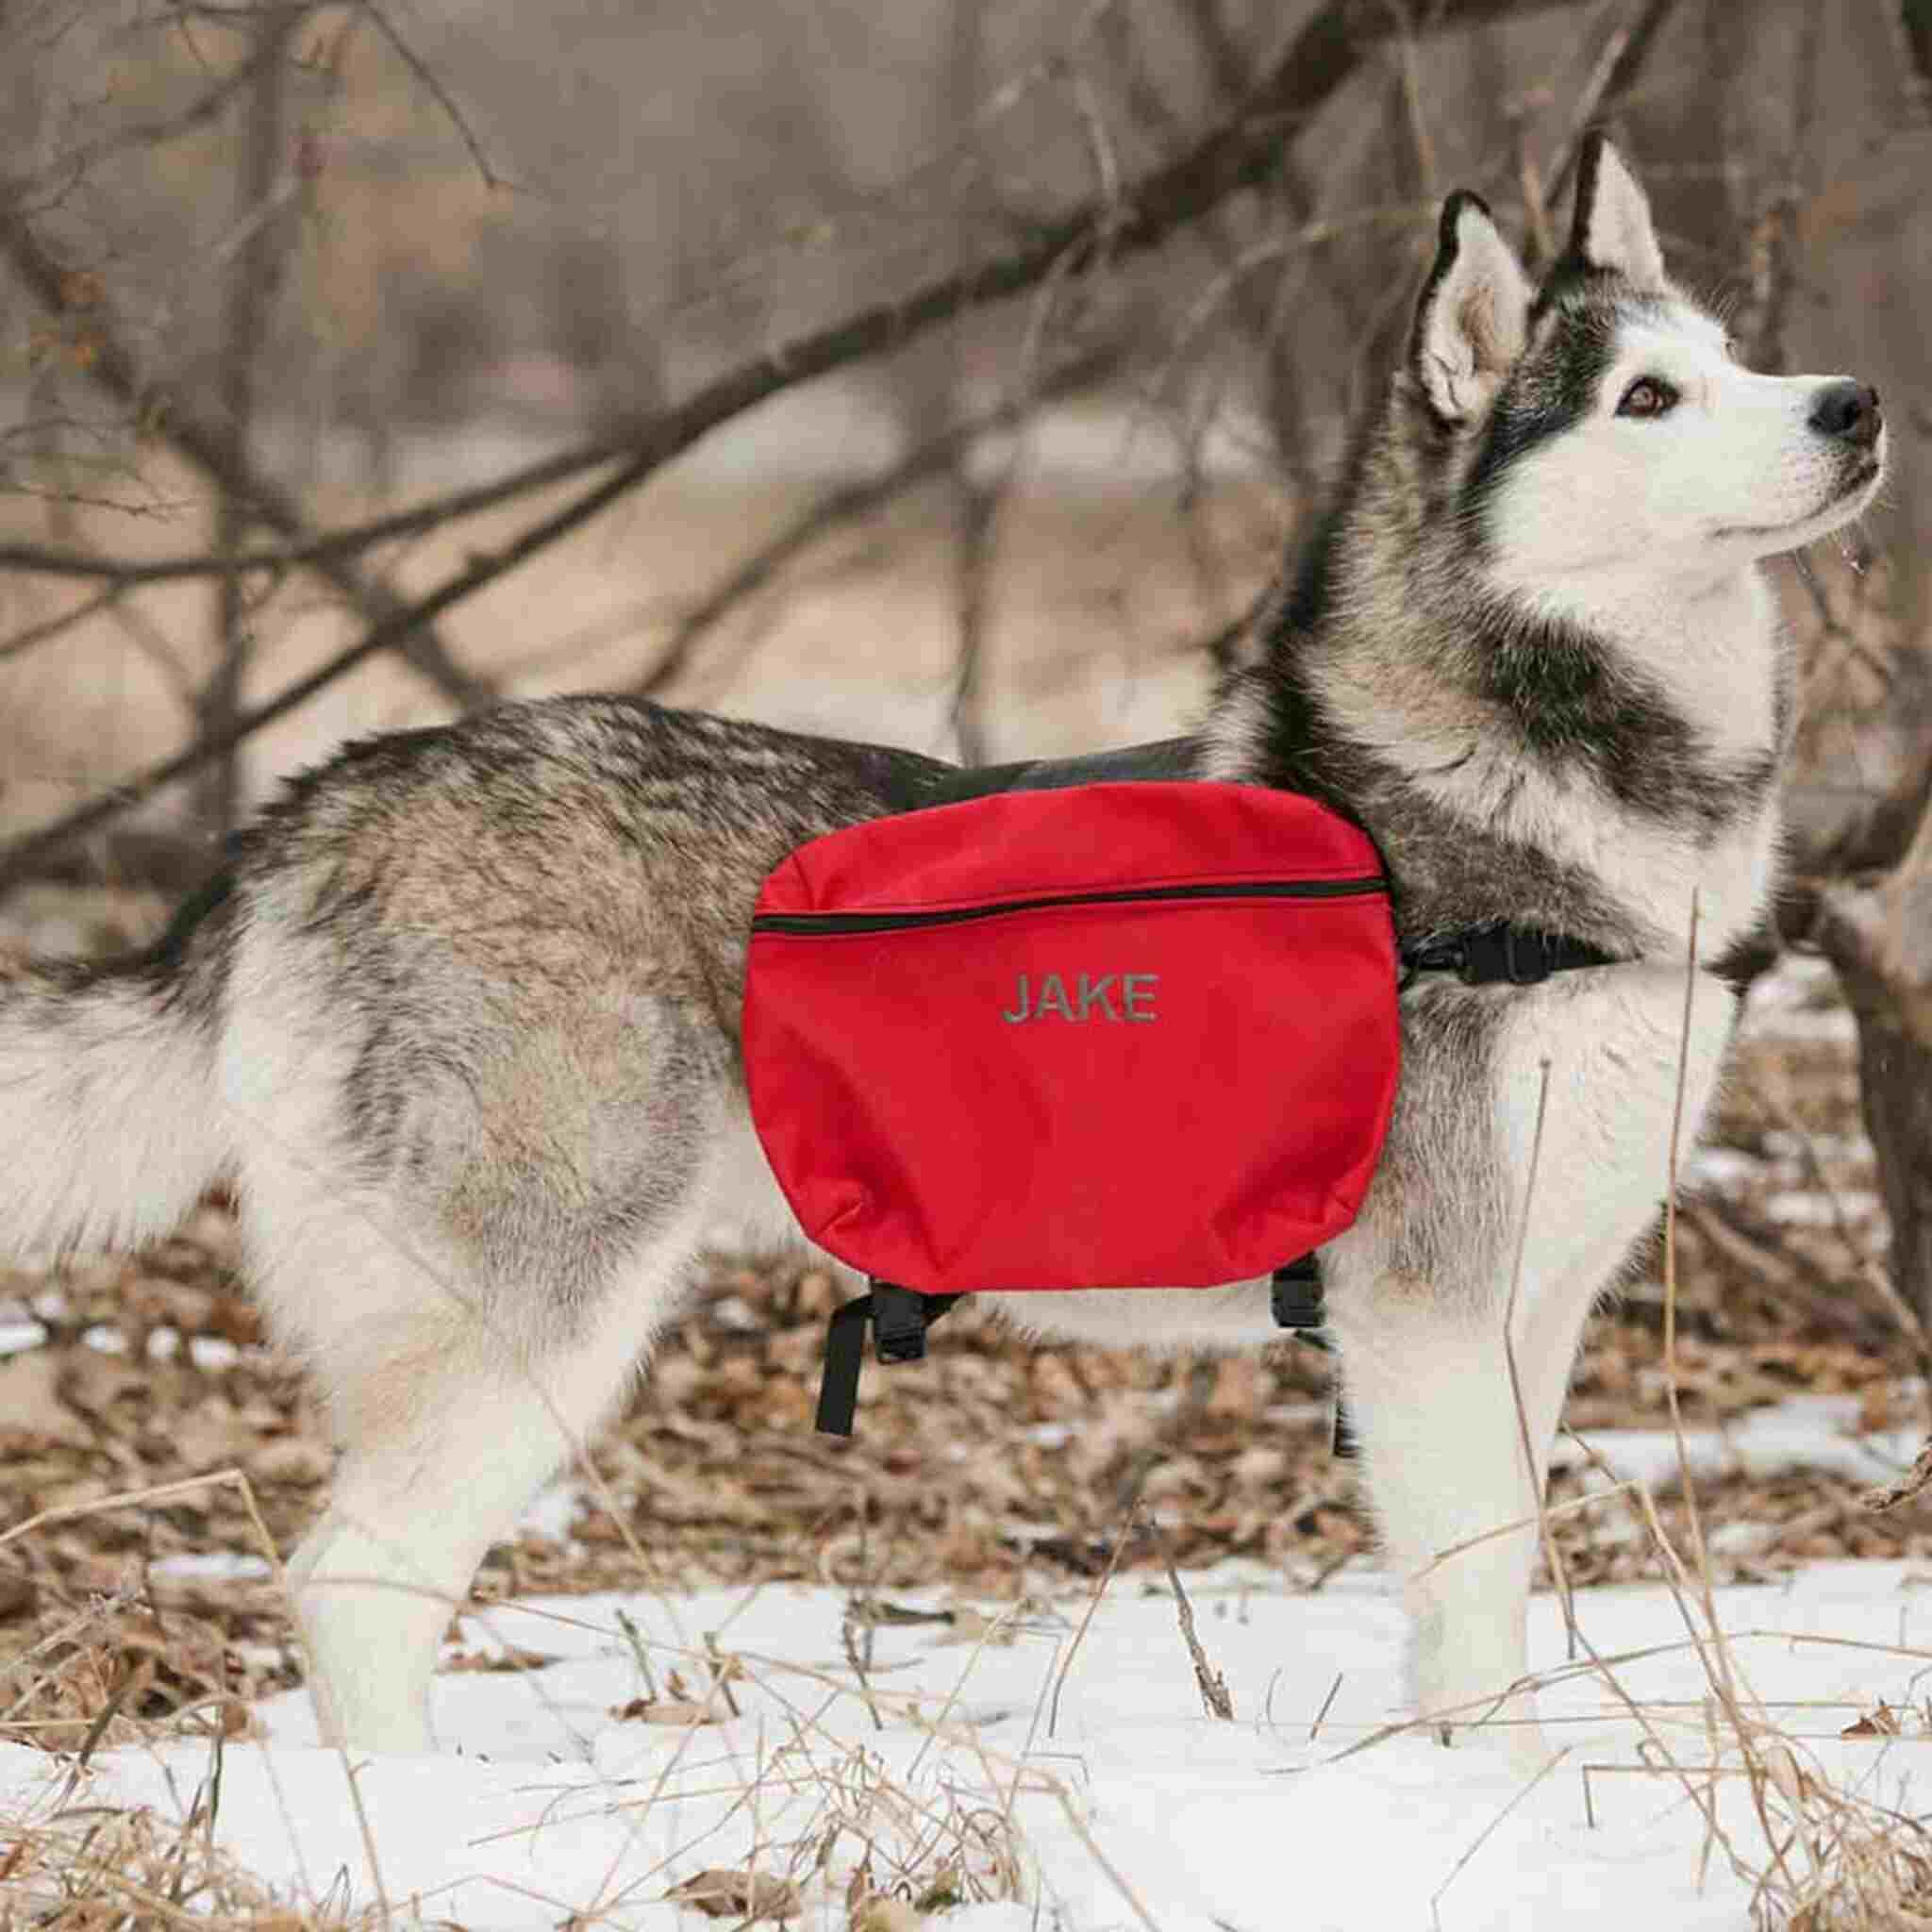 husky dog wearing red satchel